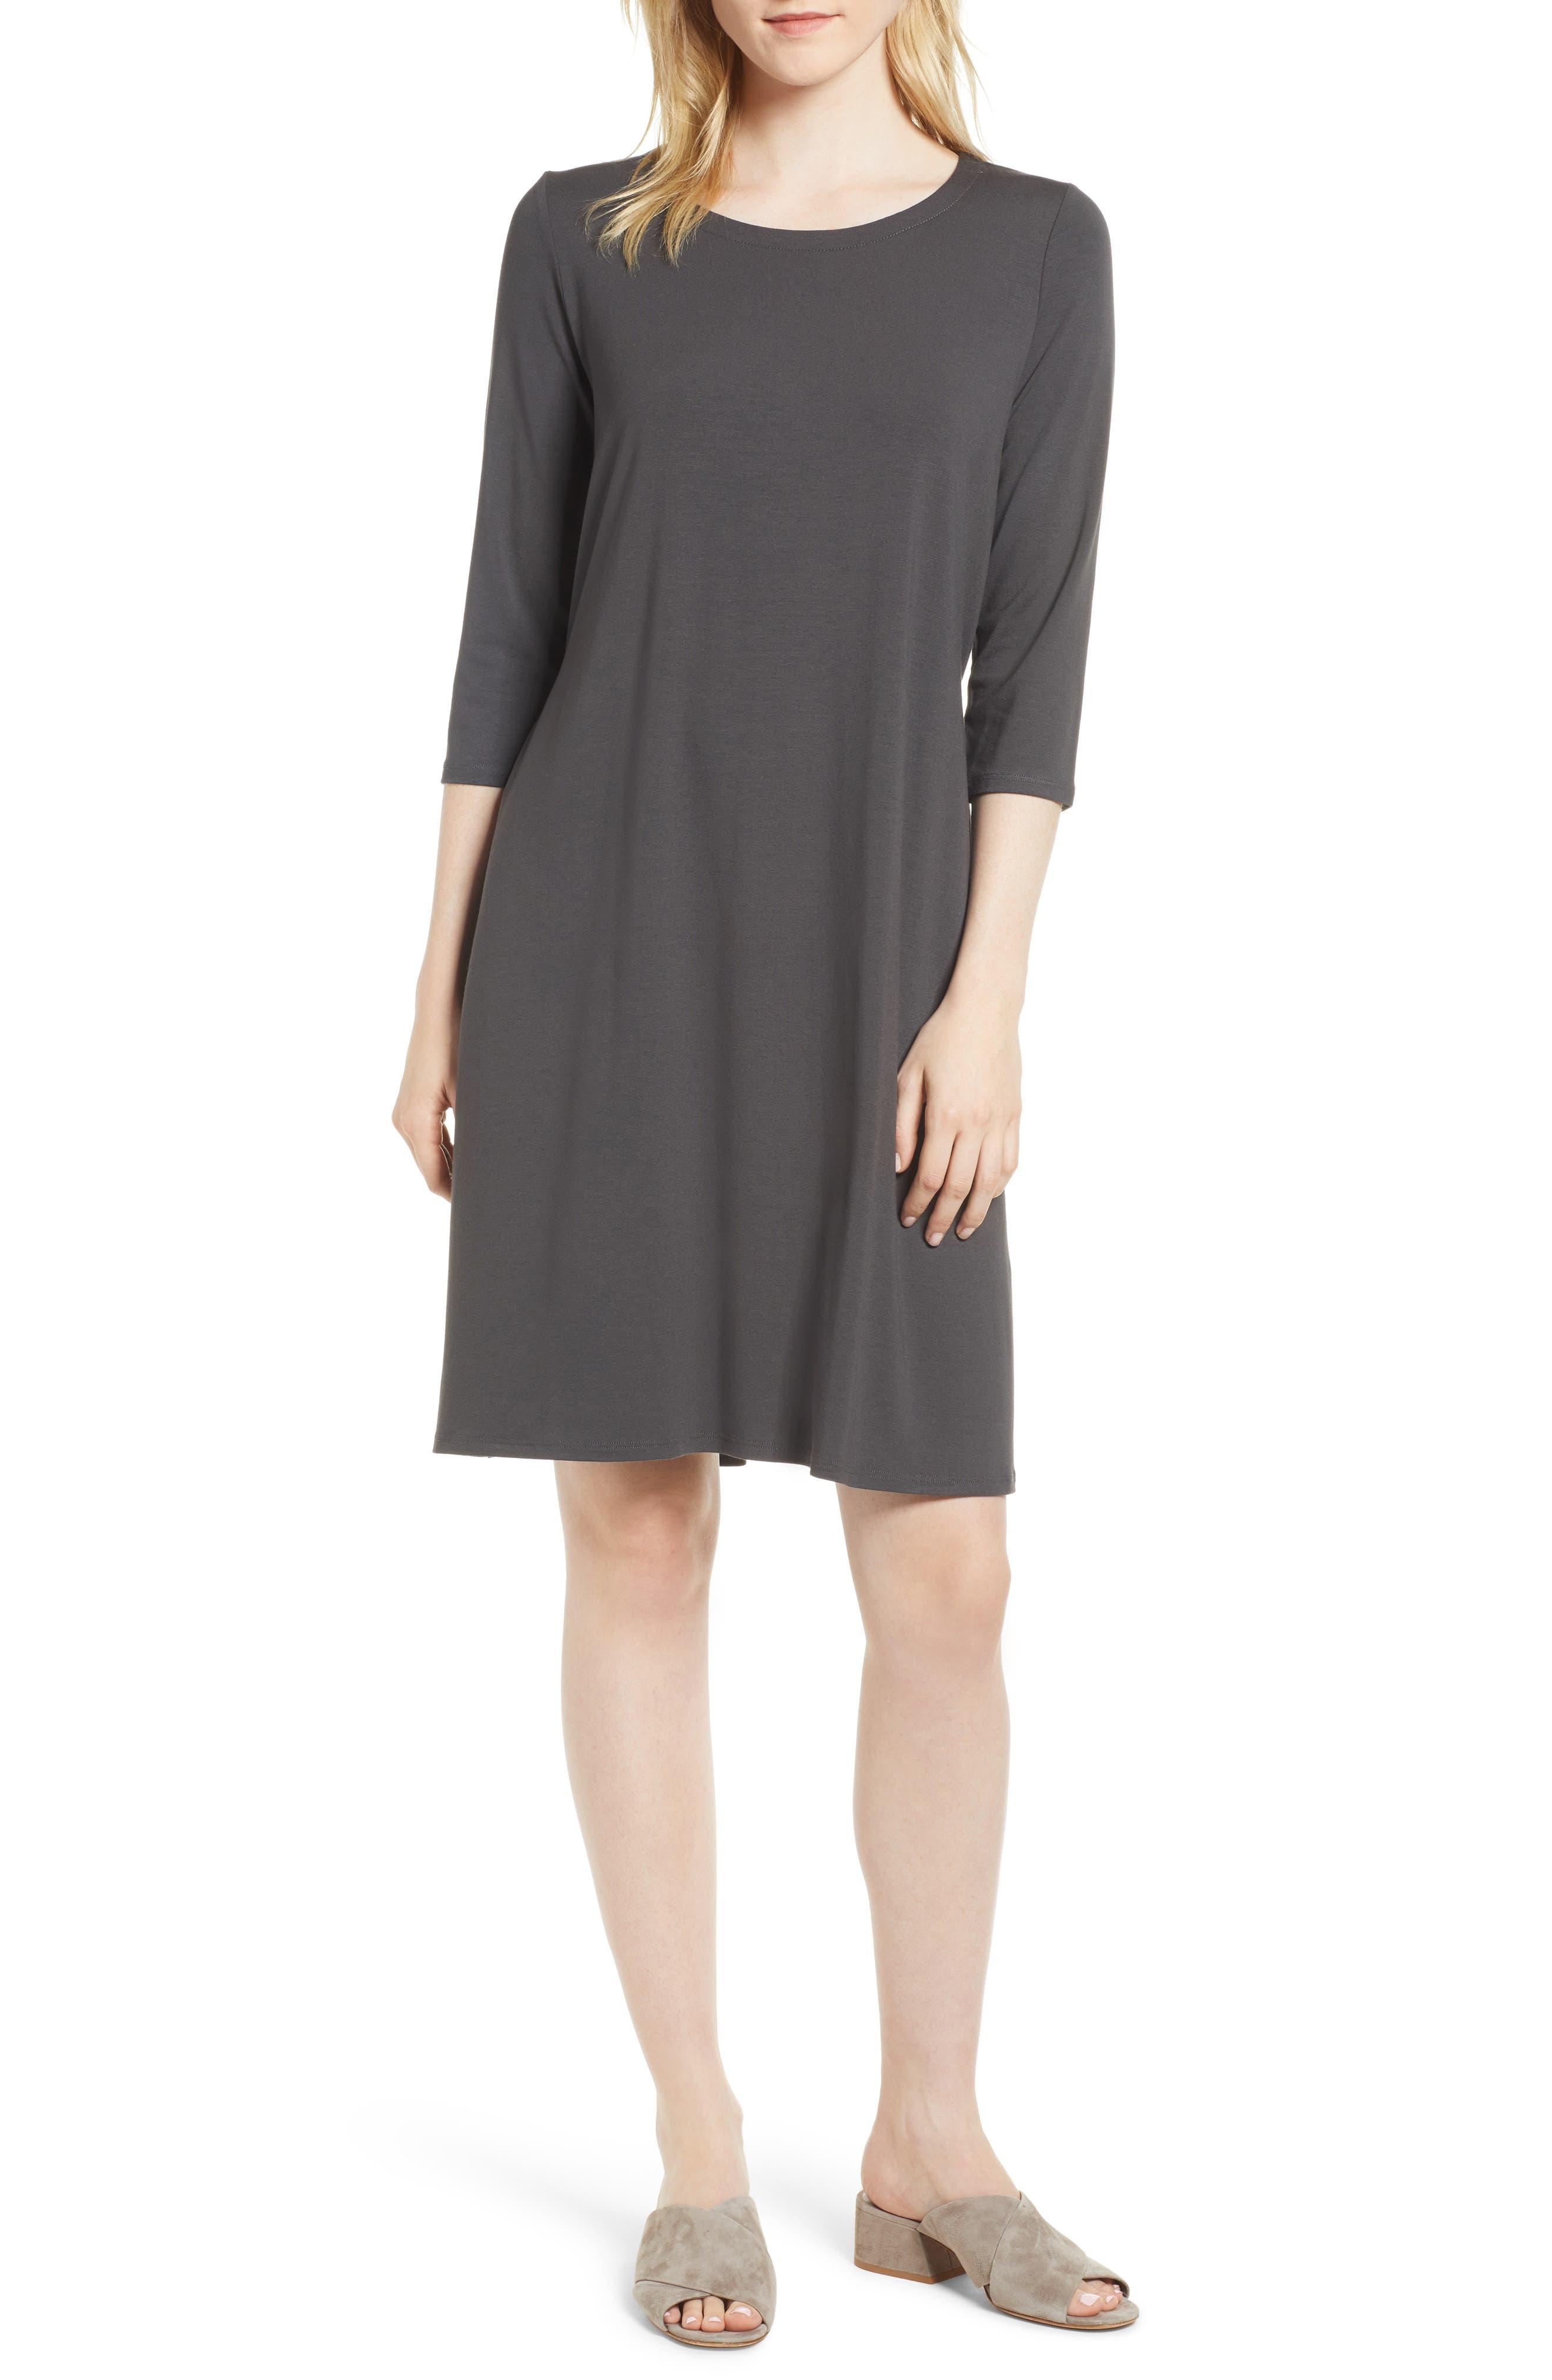 Eileen Fisher Tie Back Dress (Regular & Petite)